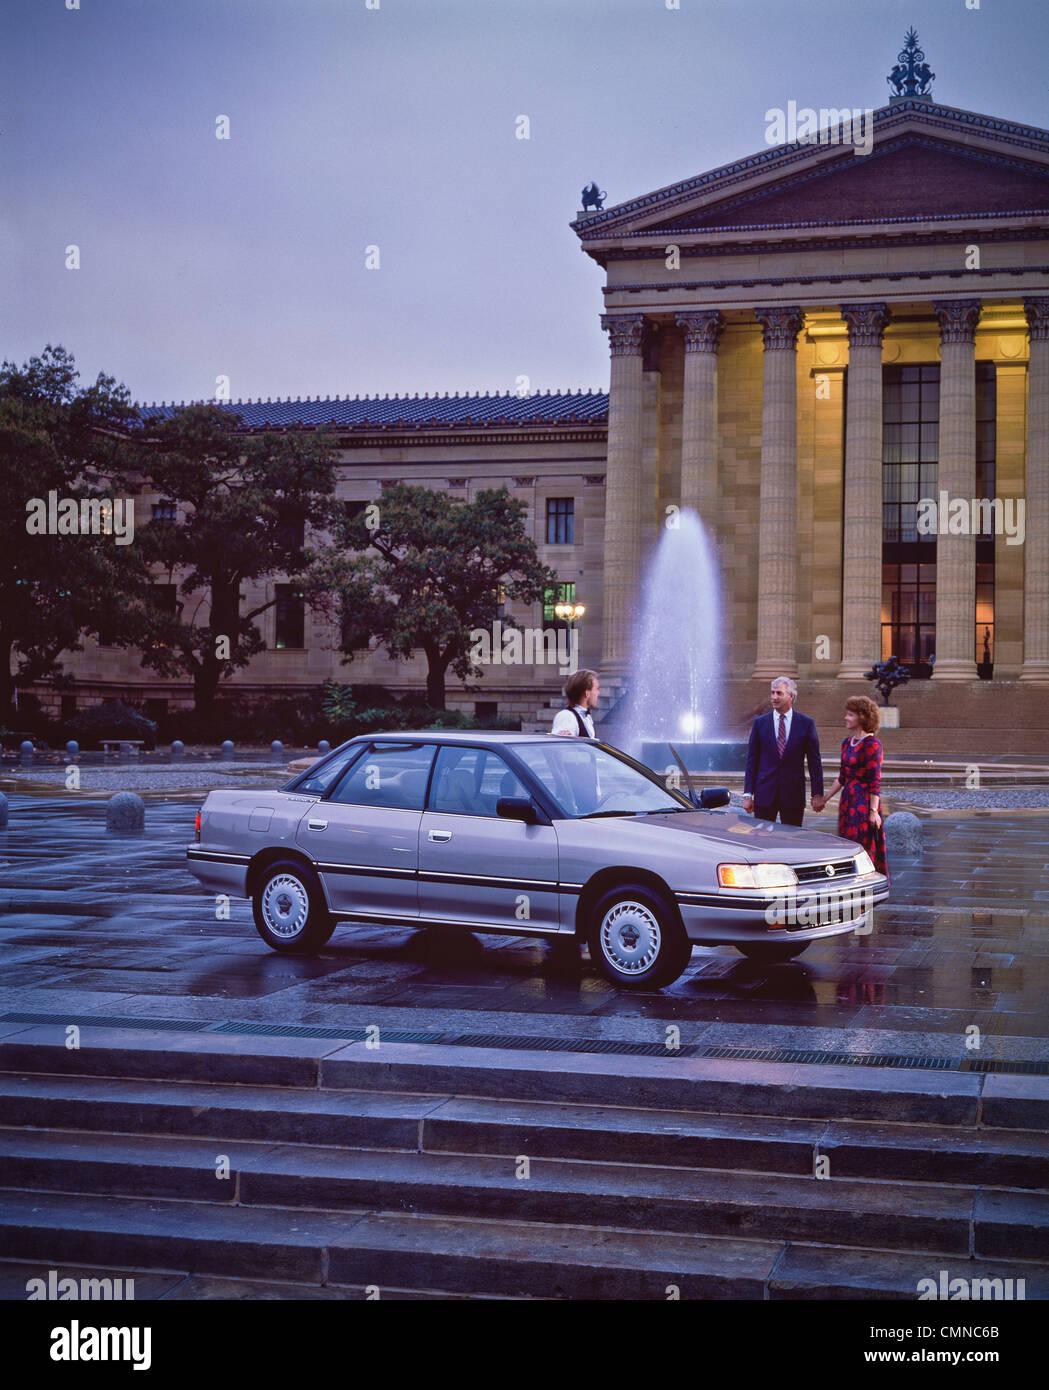 Subaru In Front Of Philadelphia Museum Of Art Stock Photo Alamy